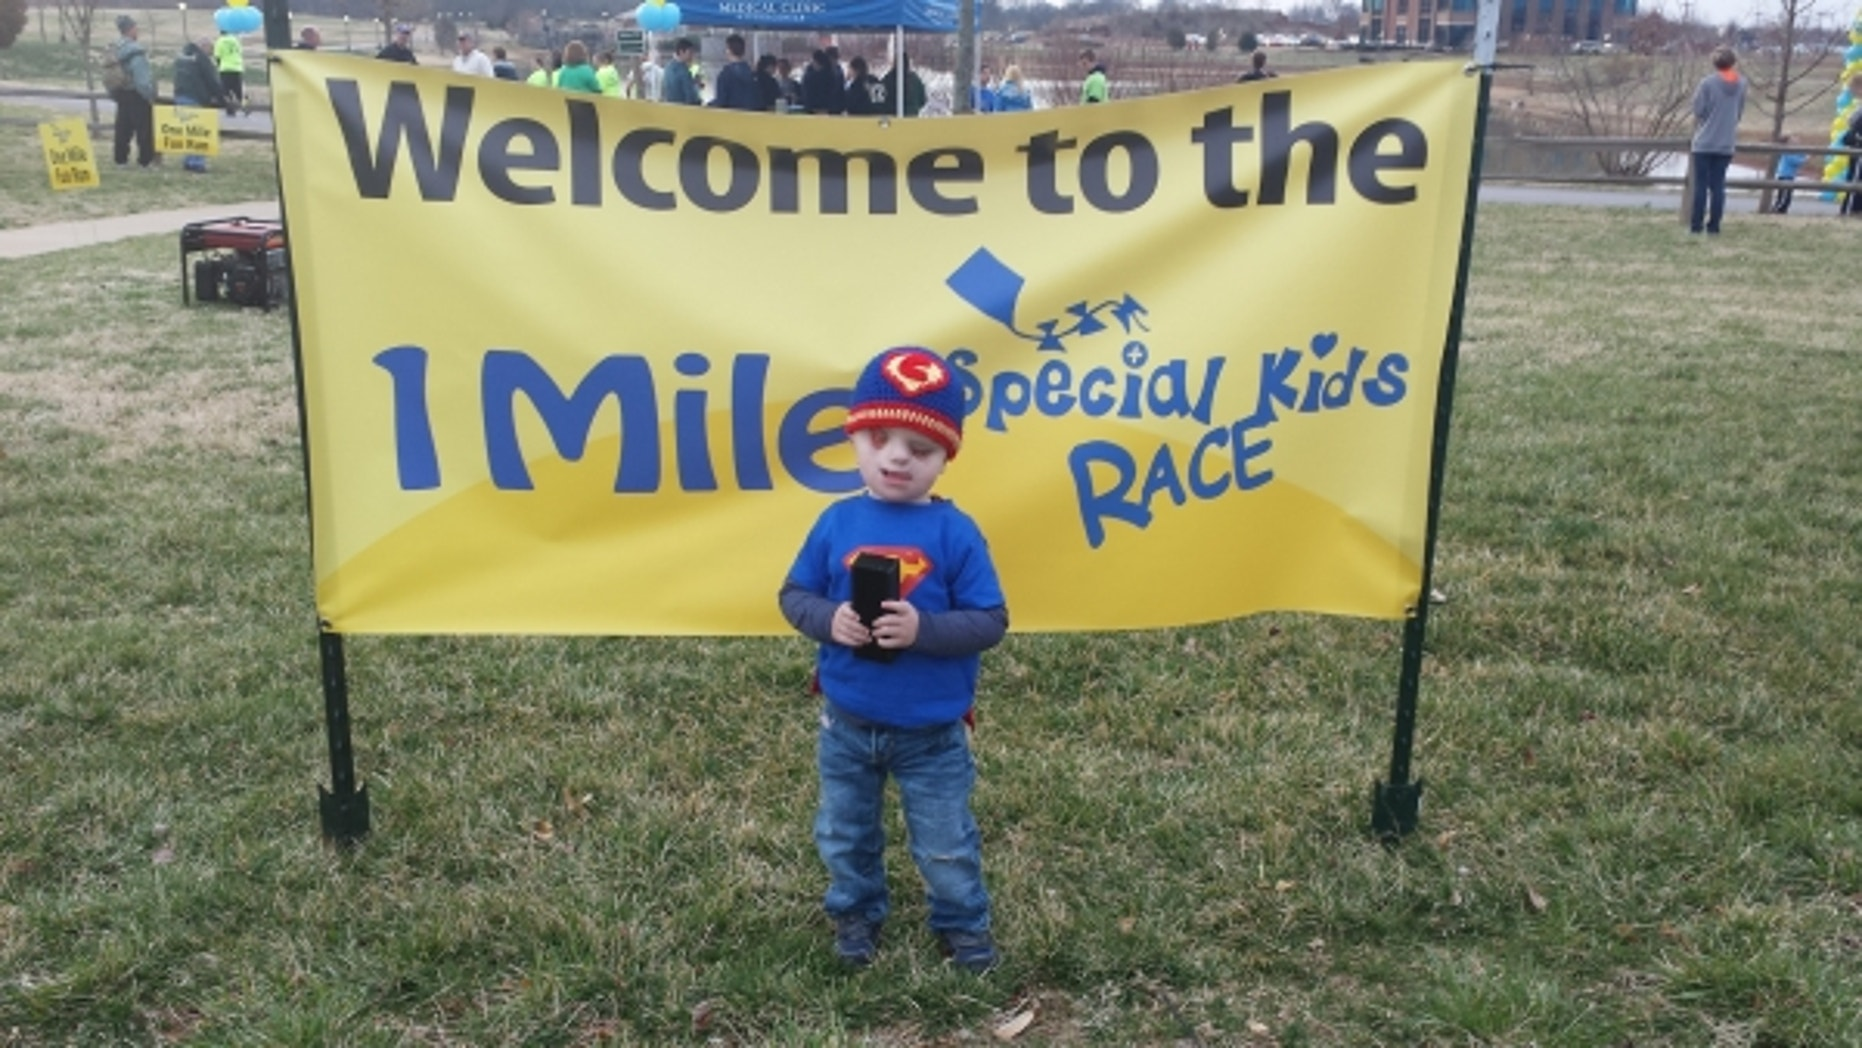 Christian Buchanan ahead of the Special Kids Race.